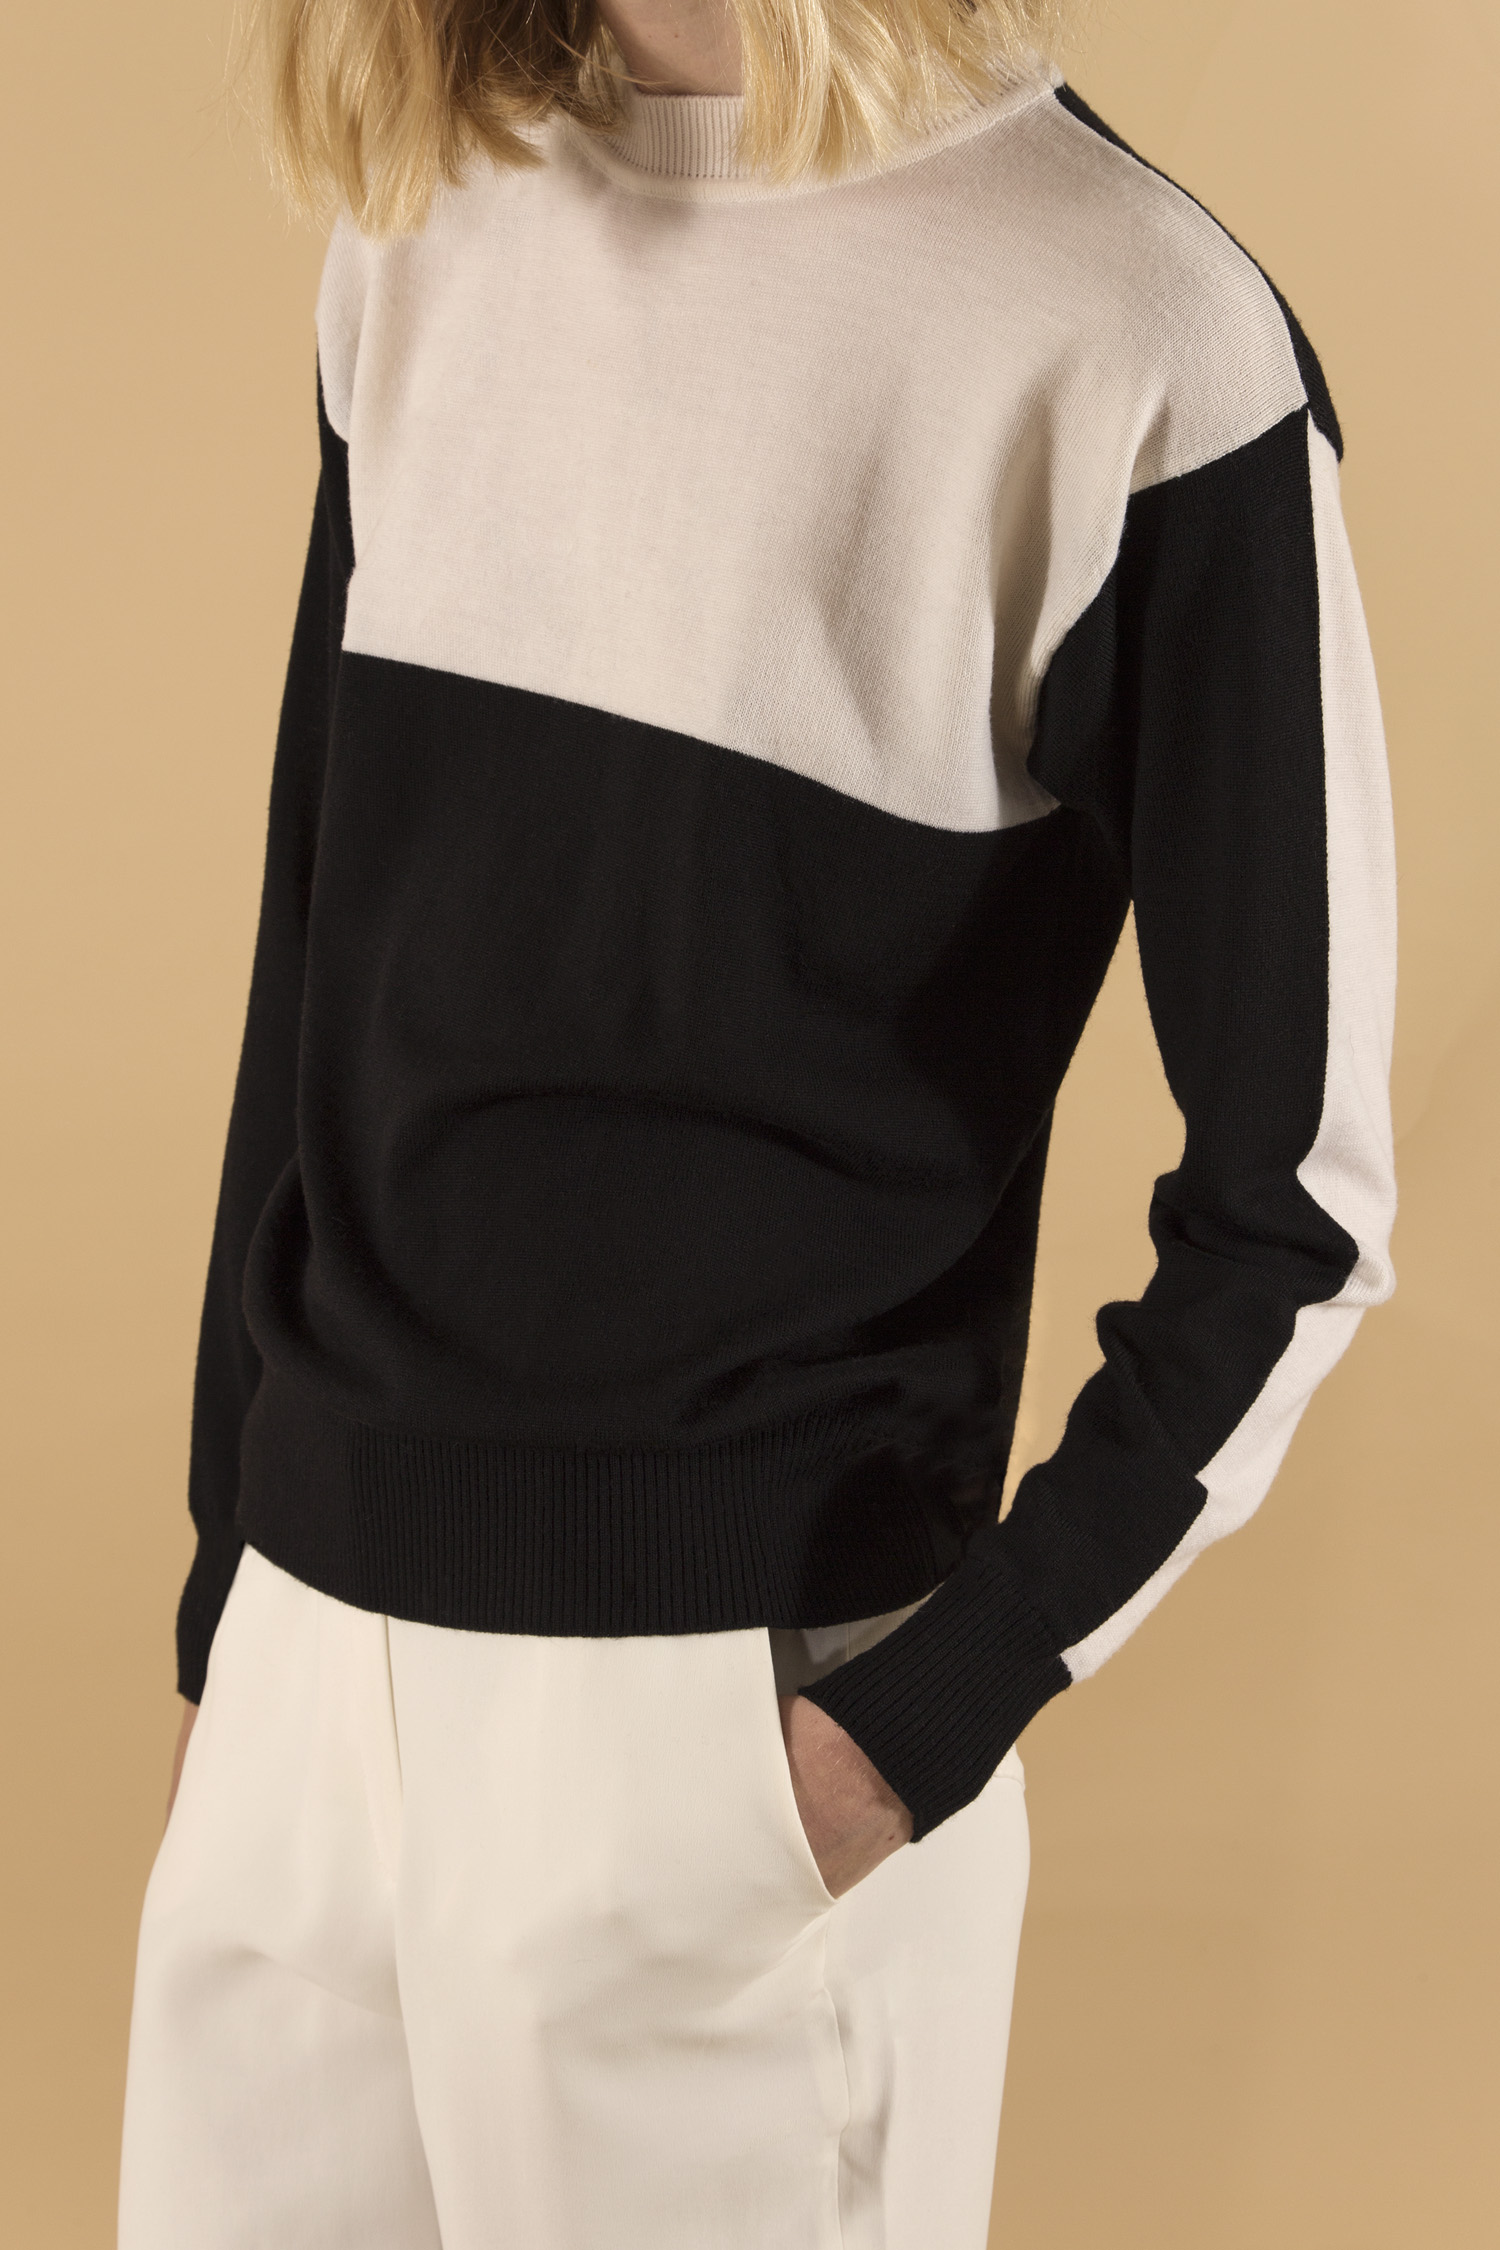 Spencer sweater, close up.jpg